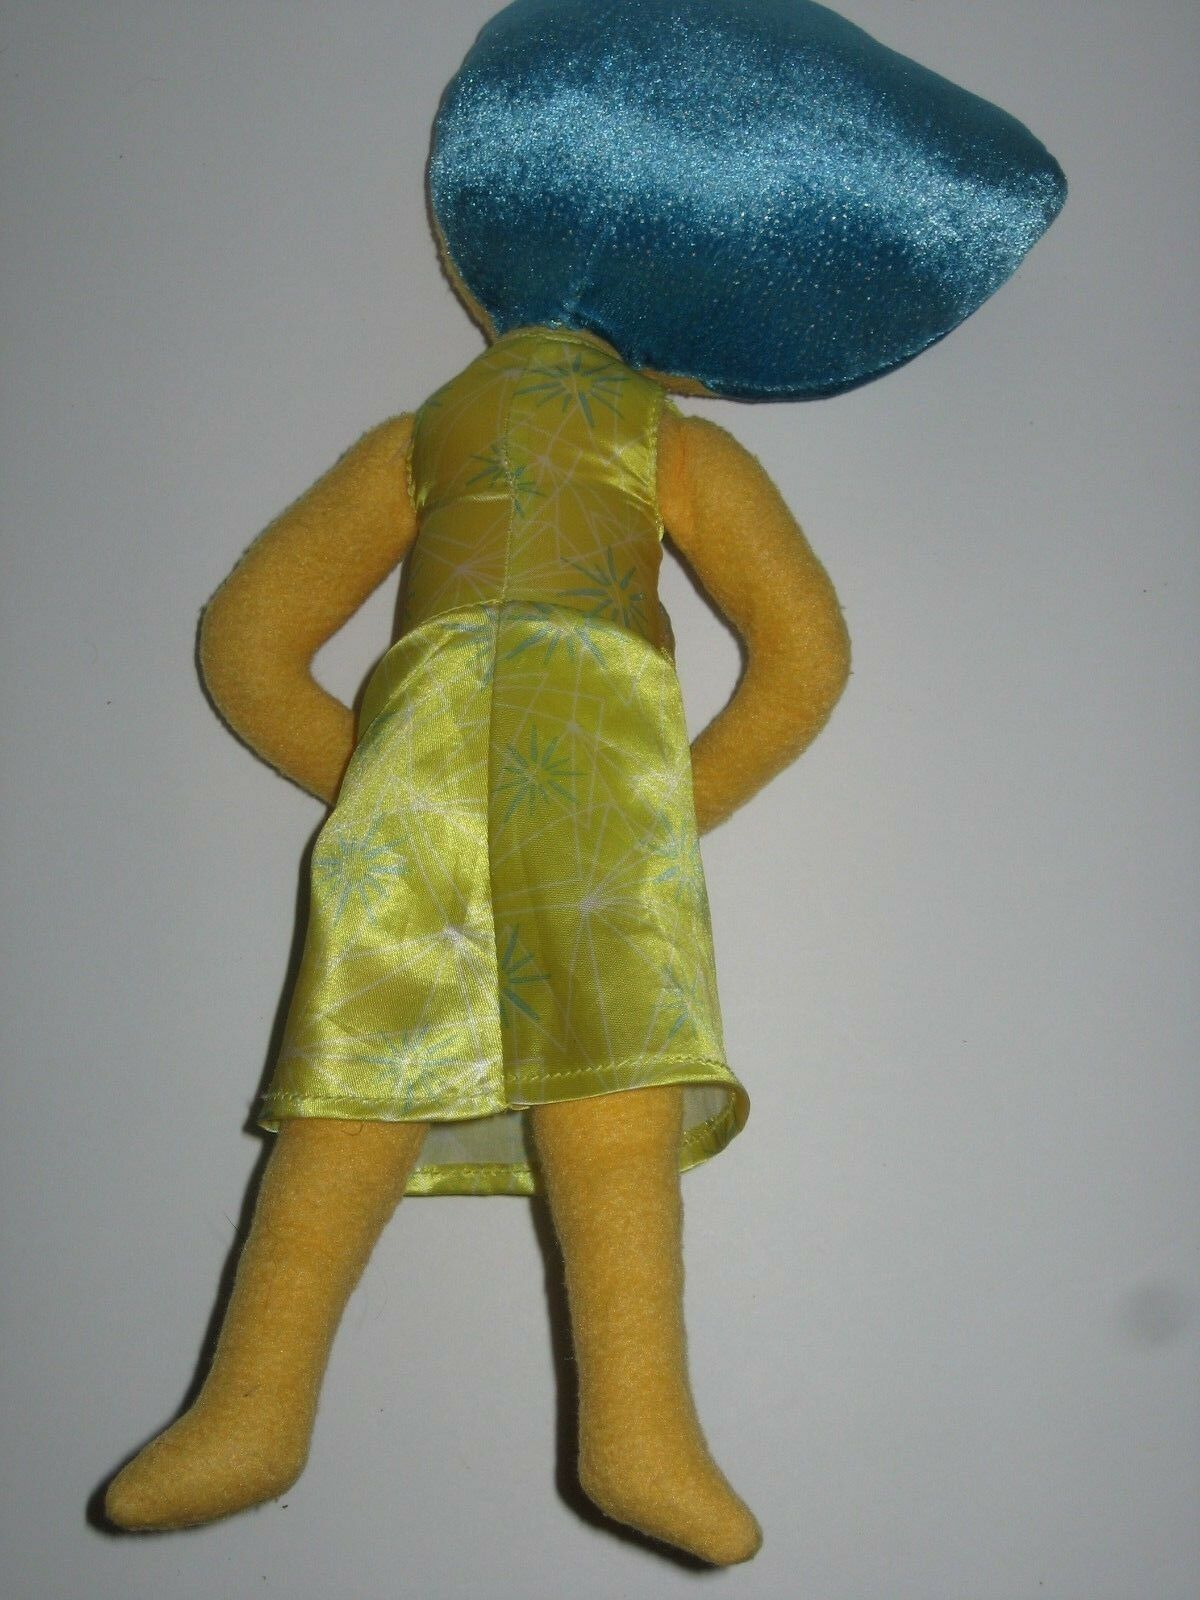 "Disney Store Pixar Inside Out Joy Plush Doll Yellow Blue Hair Eyes Dress 15"""